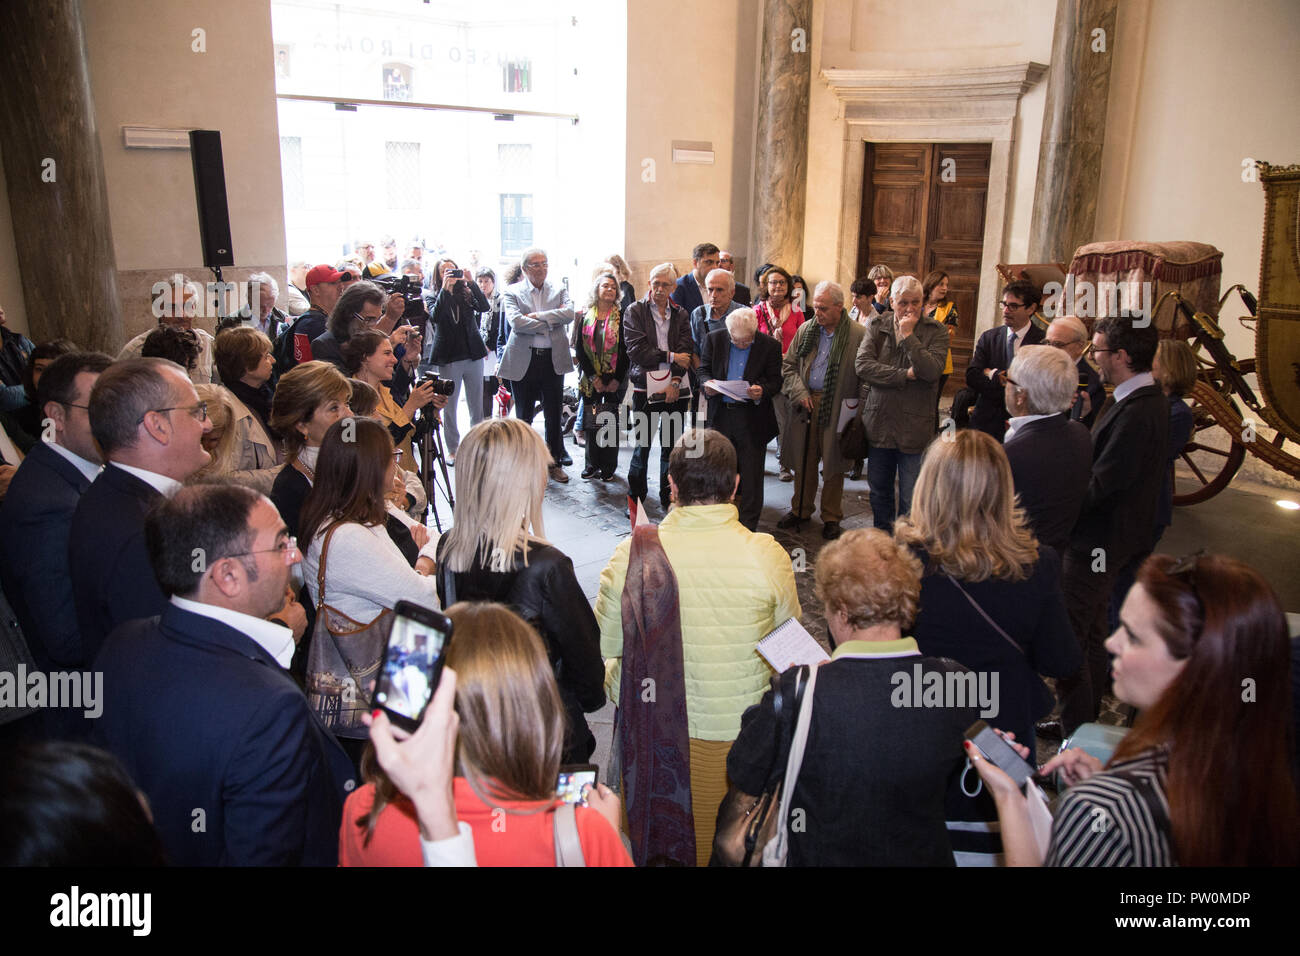 Roma, Italy. 11th Oct, 2018. Inauguration of the exhibition 'Il sorpasso. Quando l'Italia si mise a correre, 1946-1961' at the Museum of Rome in Palazzo Braschi Credit: Matteo Nardone/Pacific Press/Alamy Live News - Stock Image